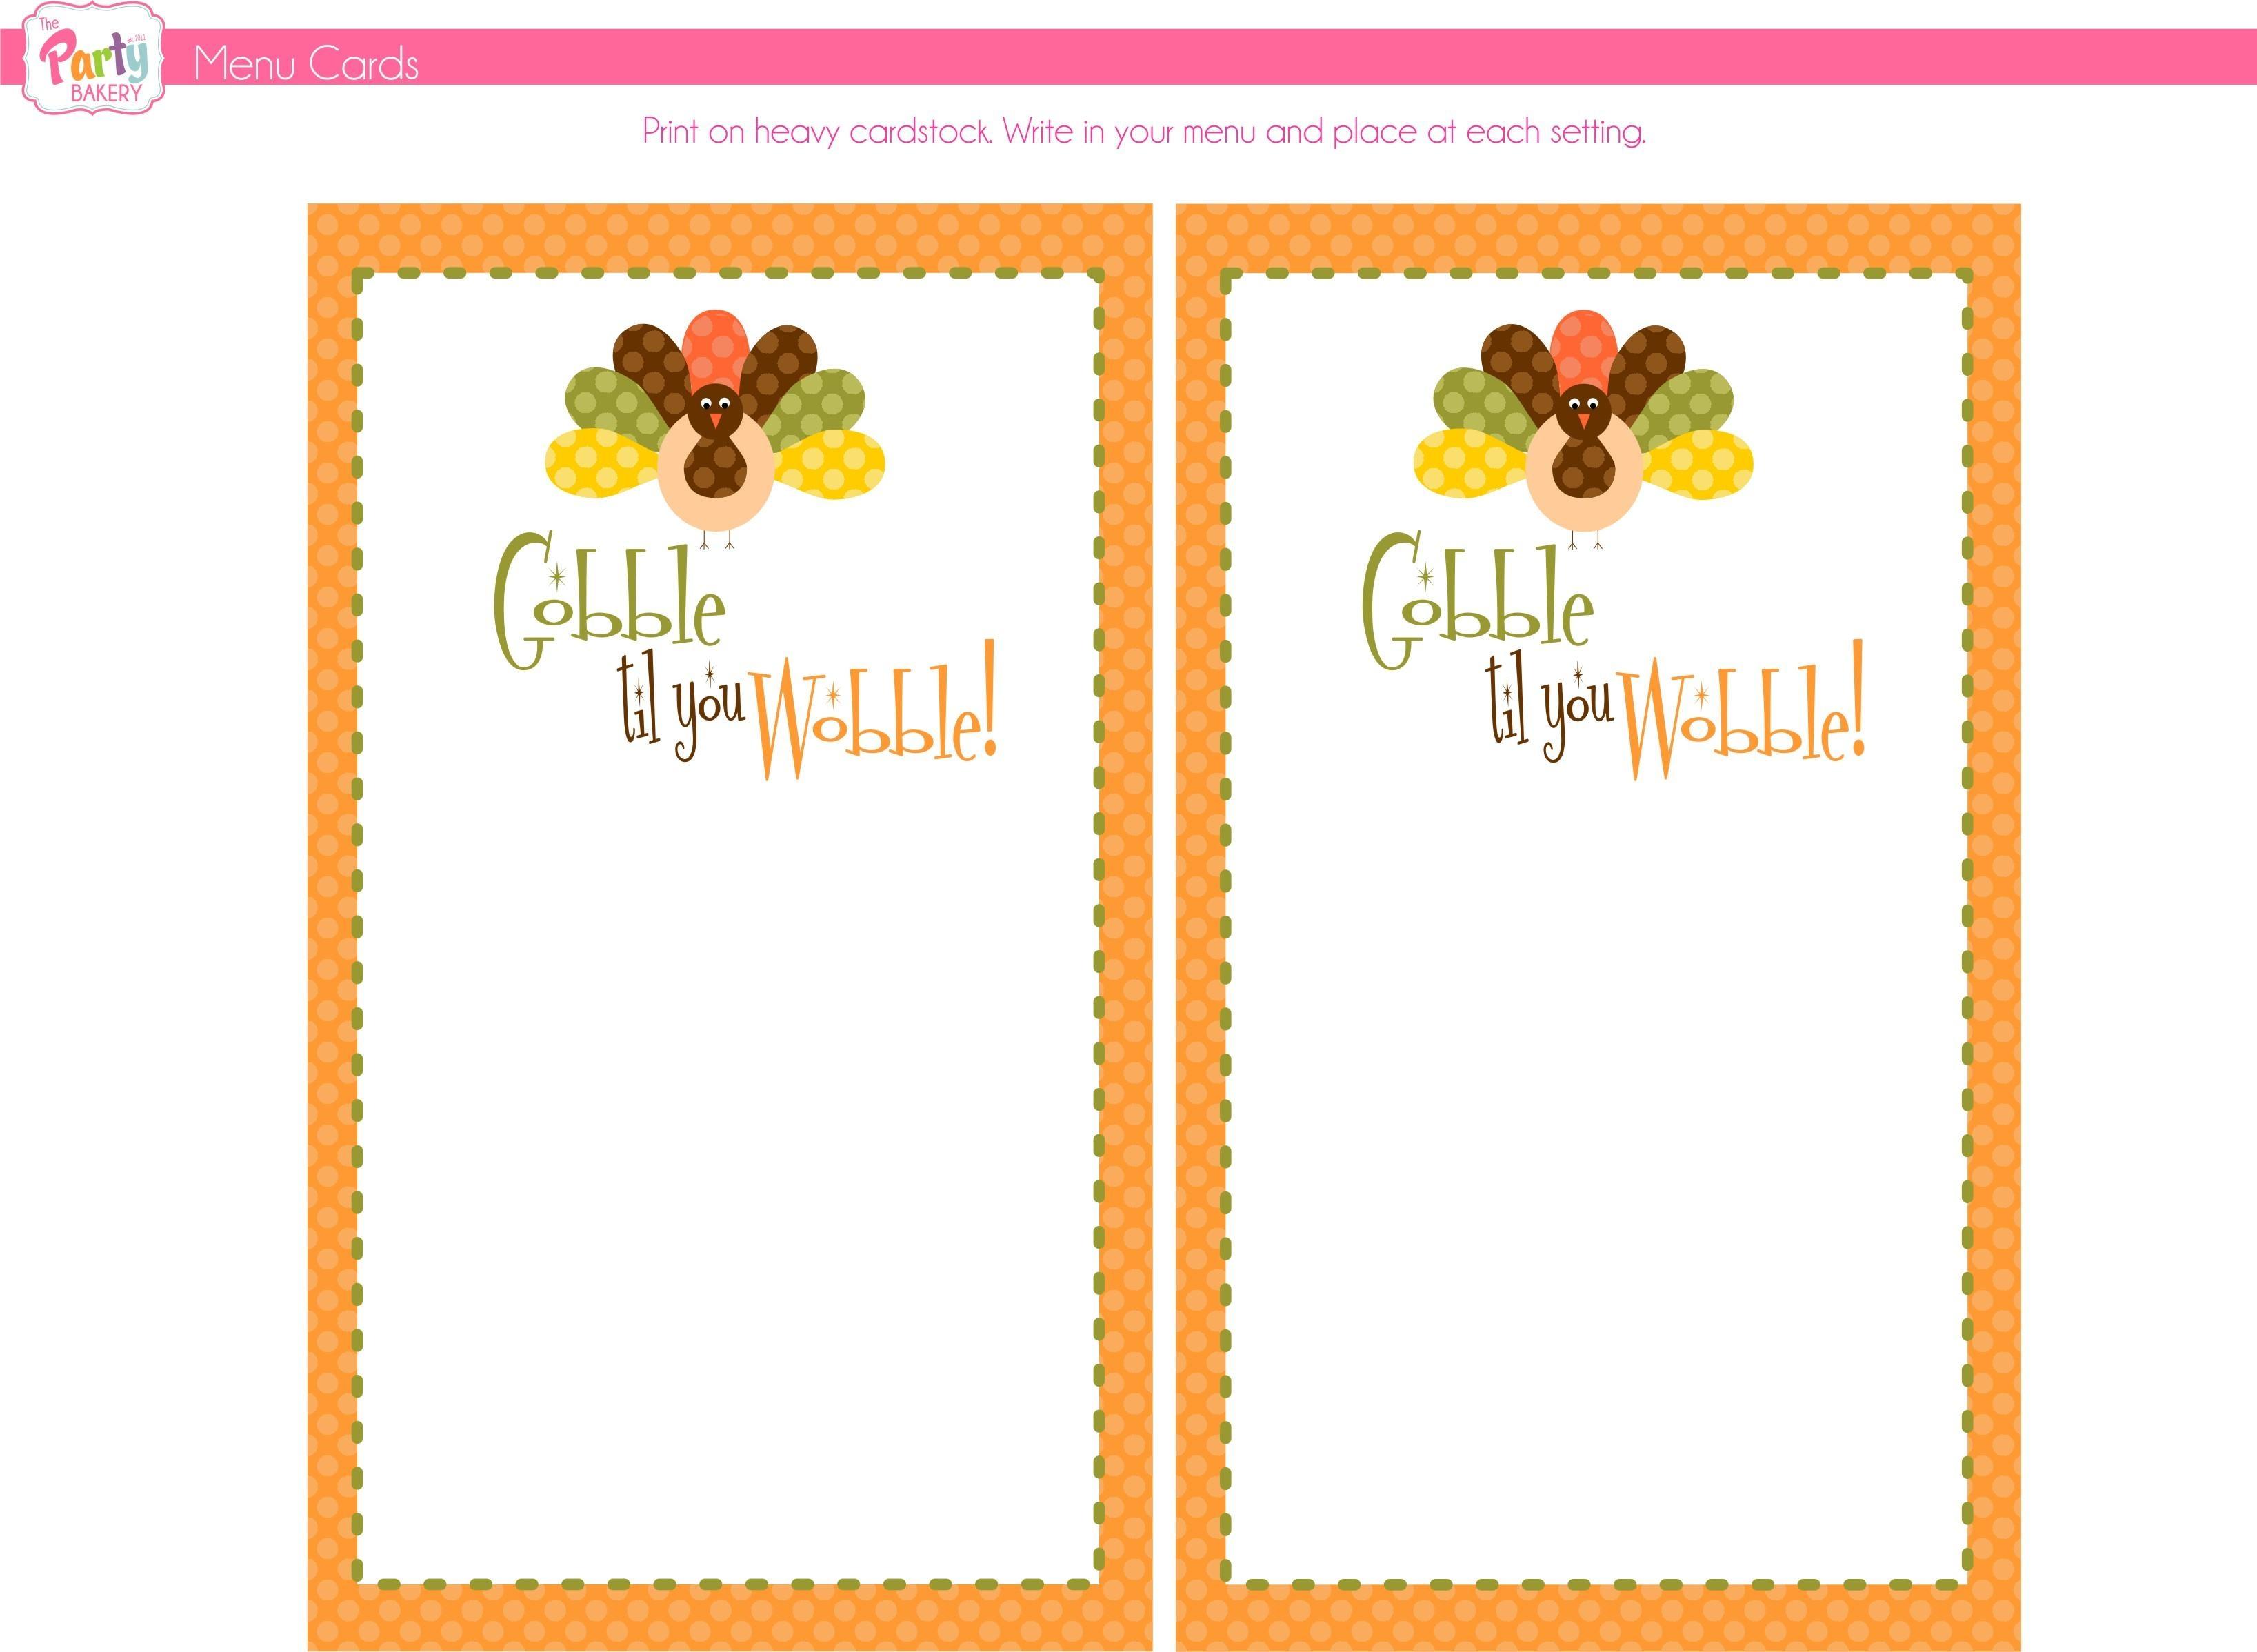 Cornucopia Invites Amazing Free Printable Thanksgiving Invitation - Free Printable Thanksgiving Dinner Invitation Templates